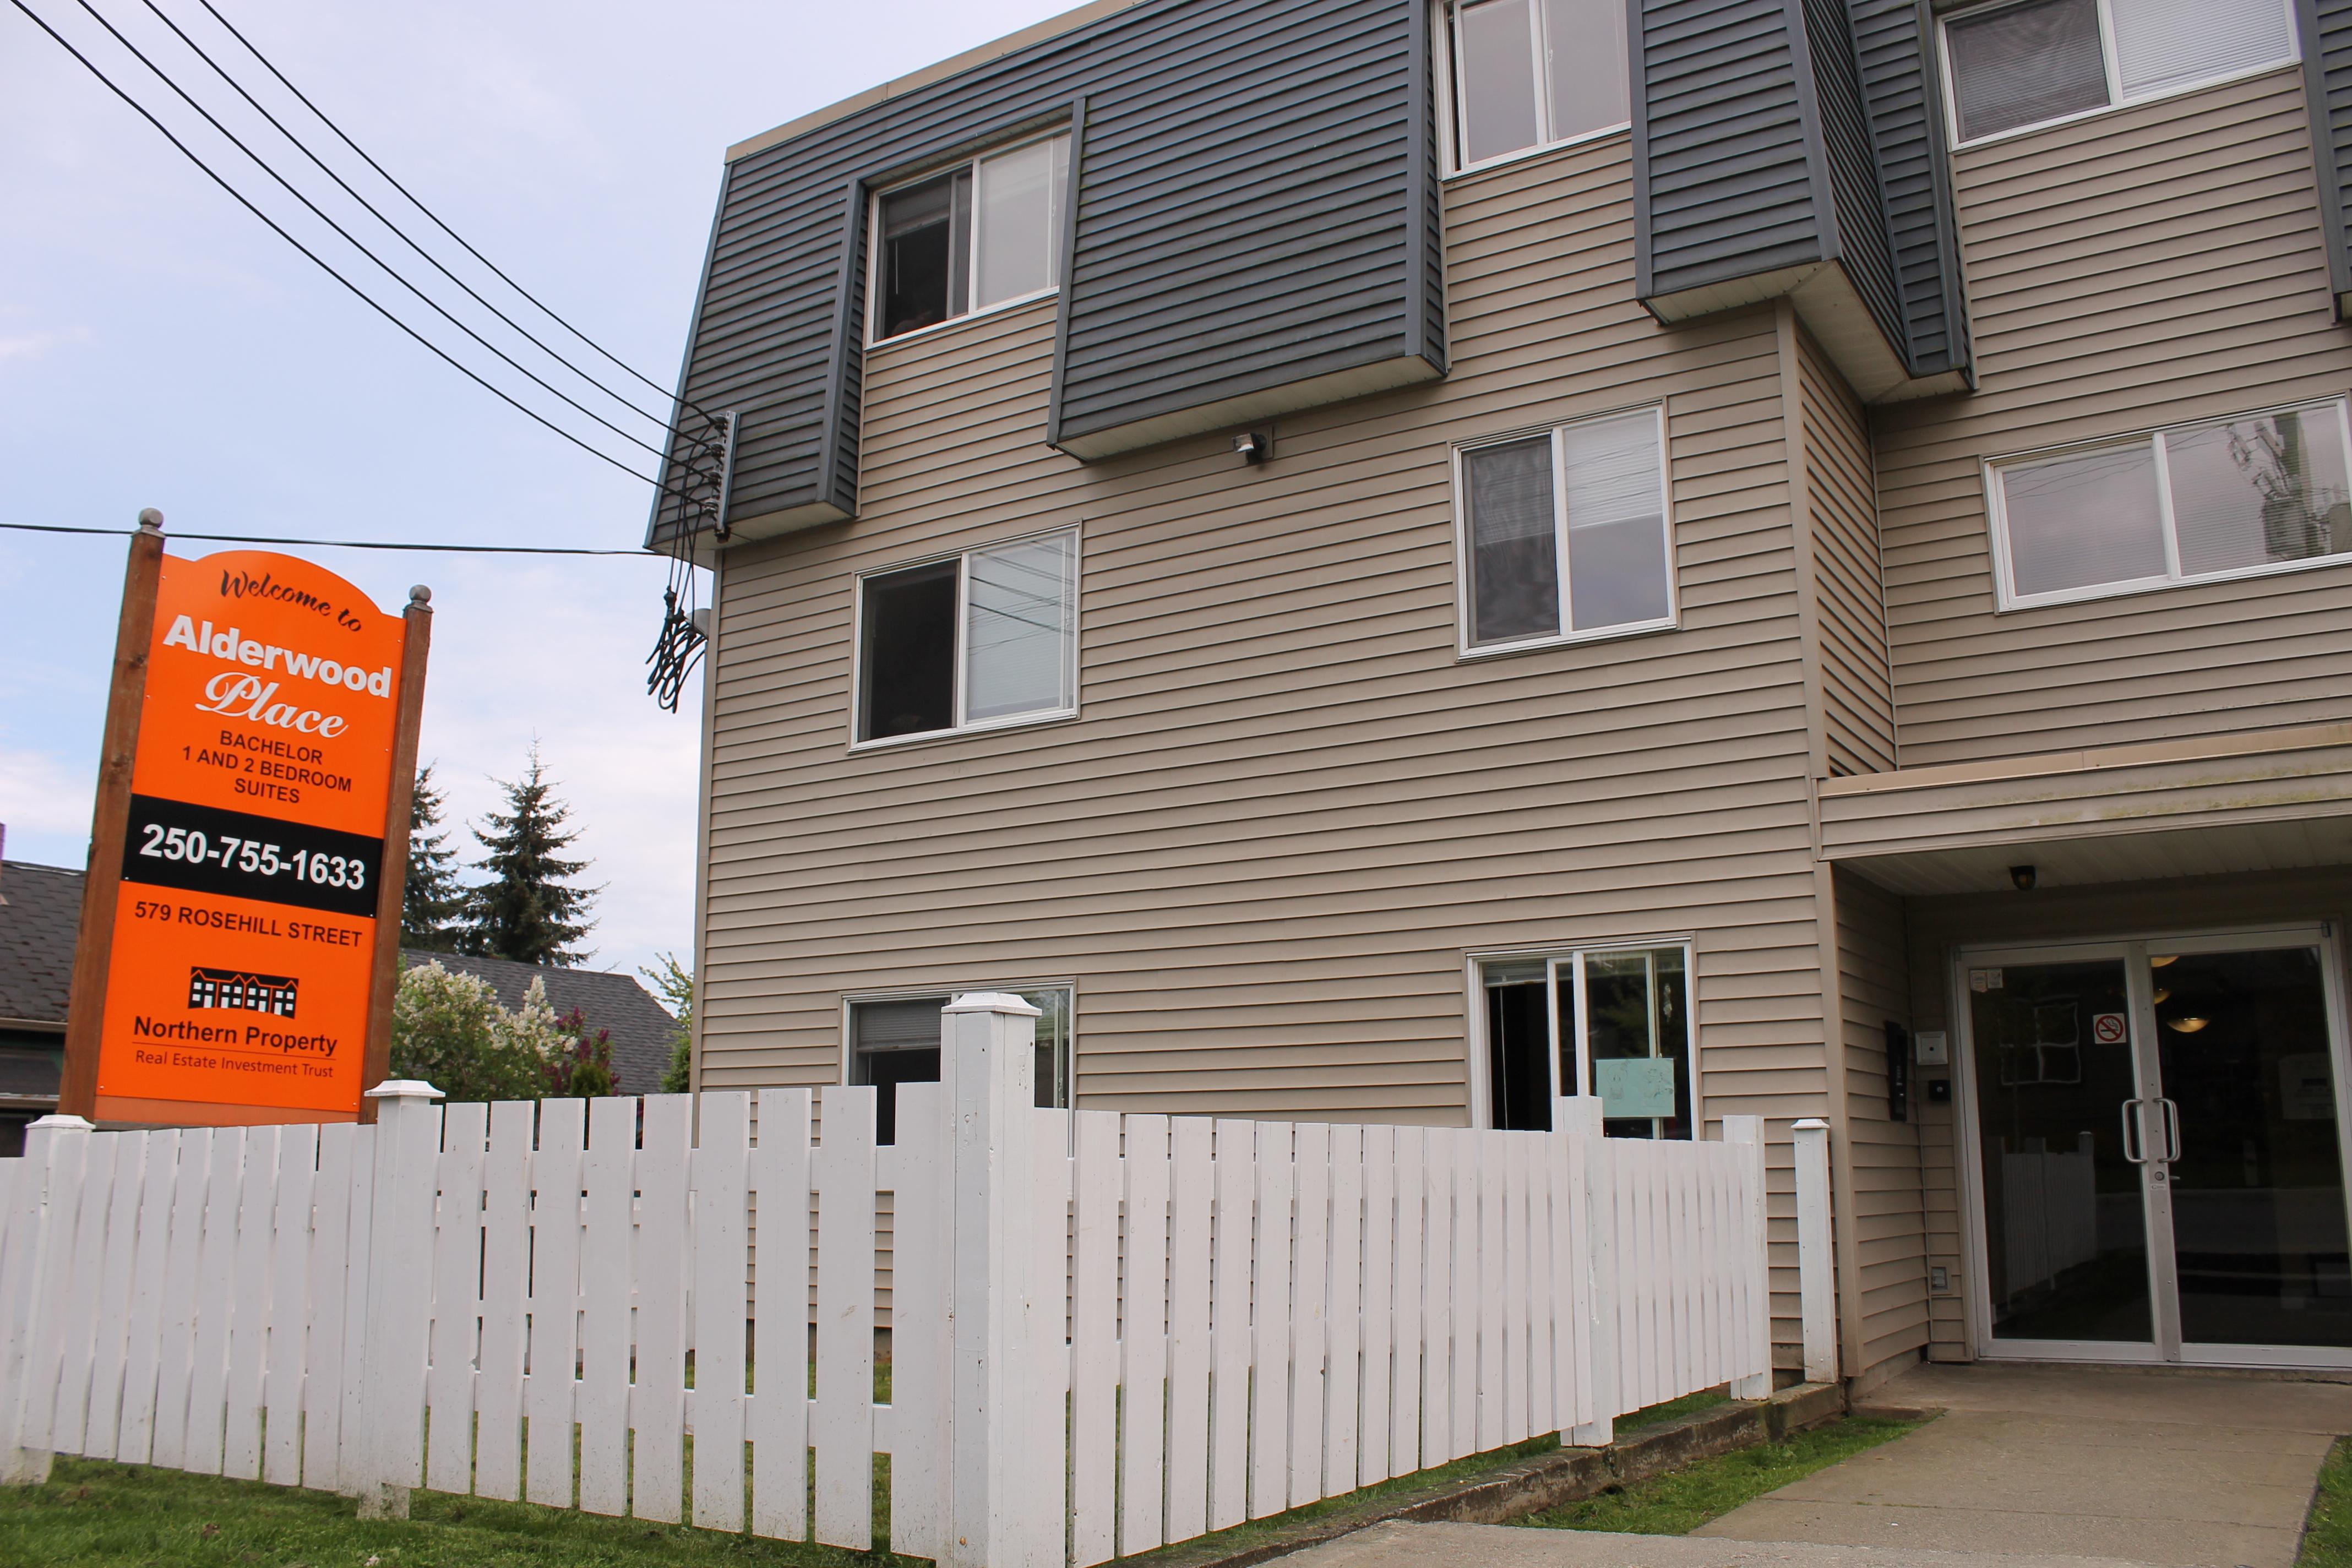 Alderwood Place 579 Rosehill Street Nanaimo Apartments